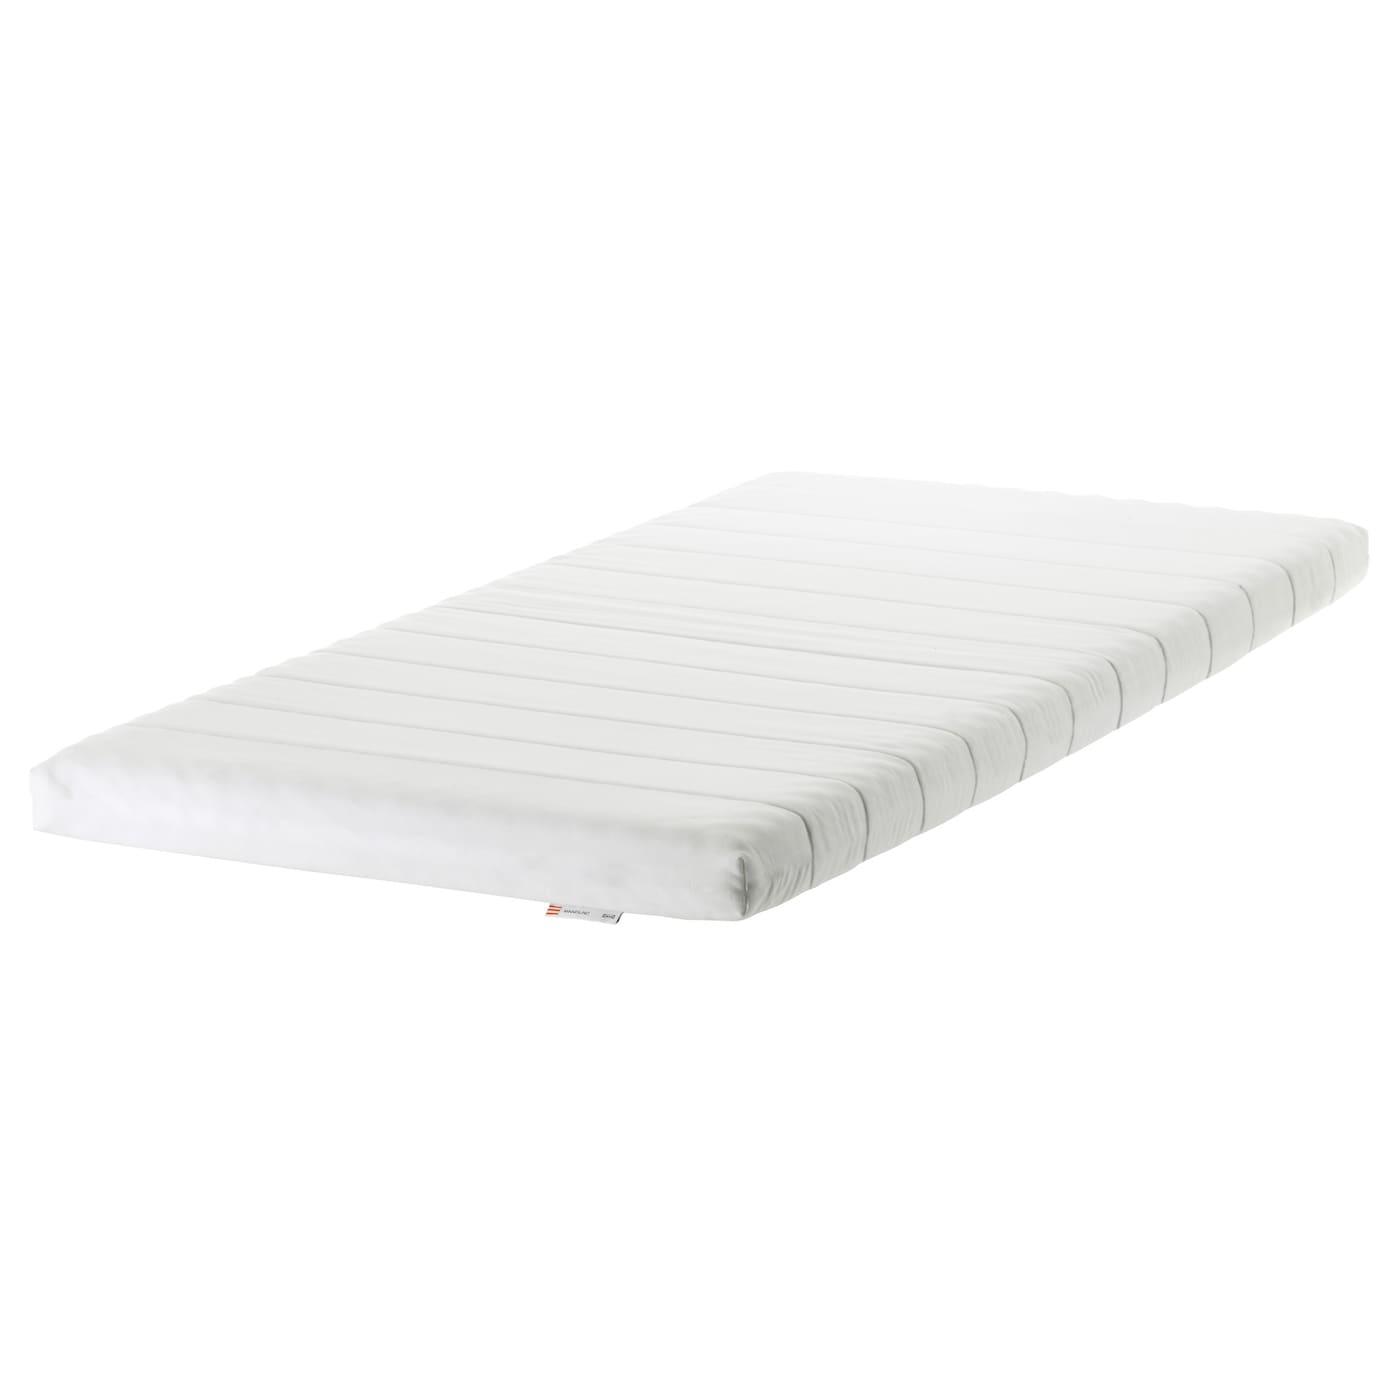 Minnesund Foam Mattress Firm White Ikea